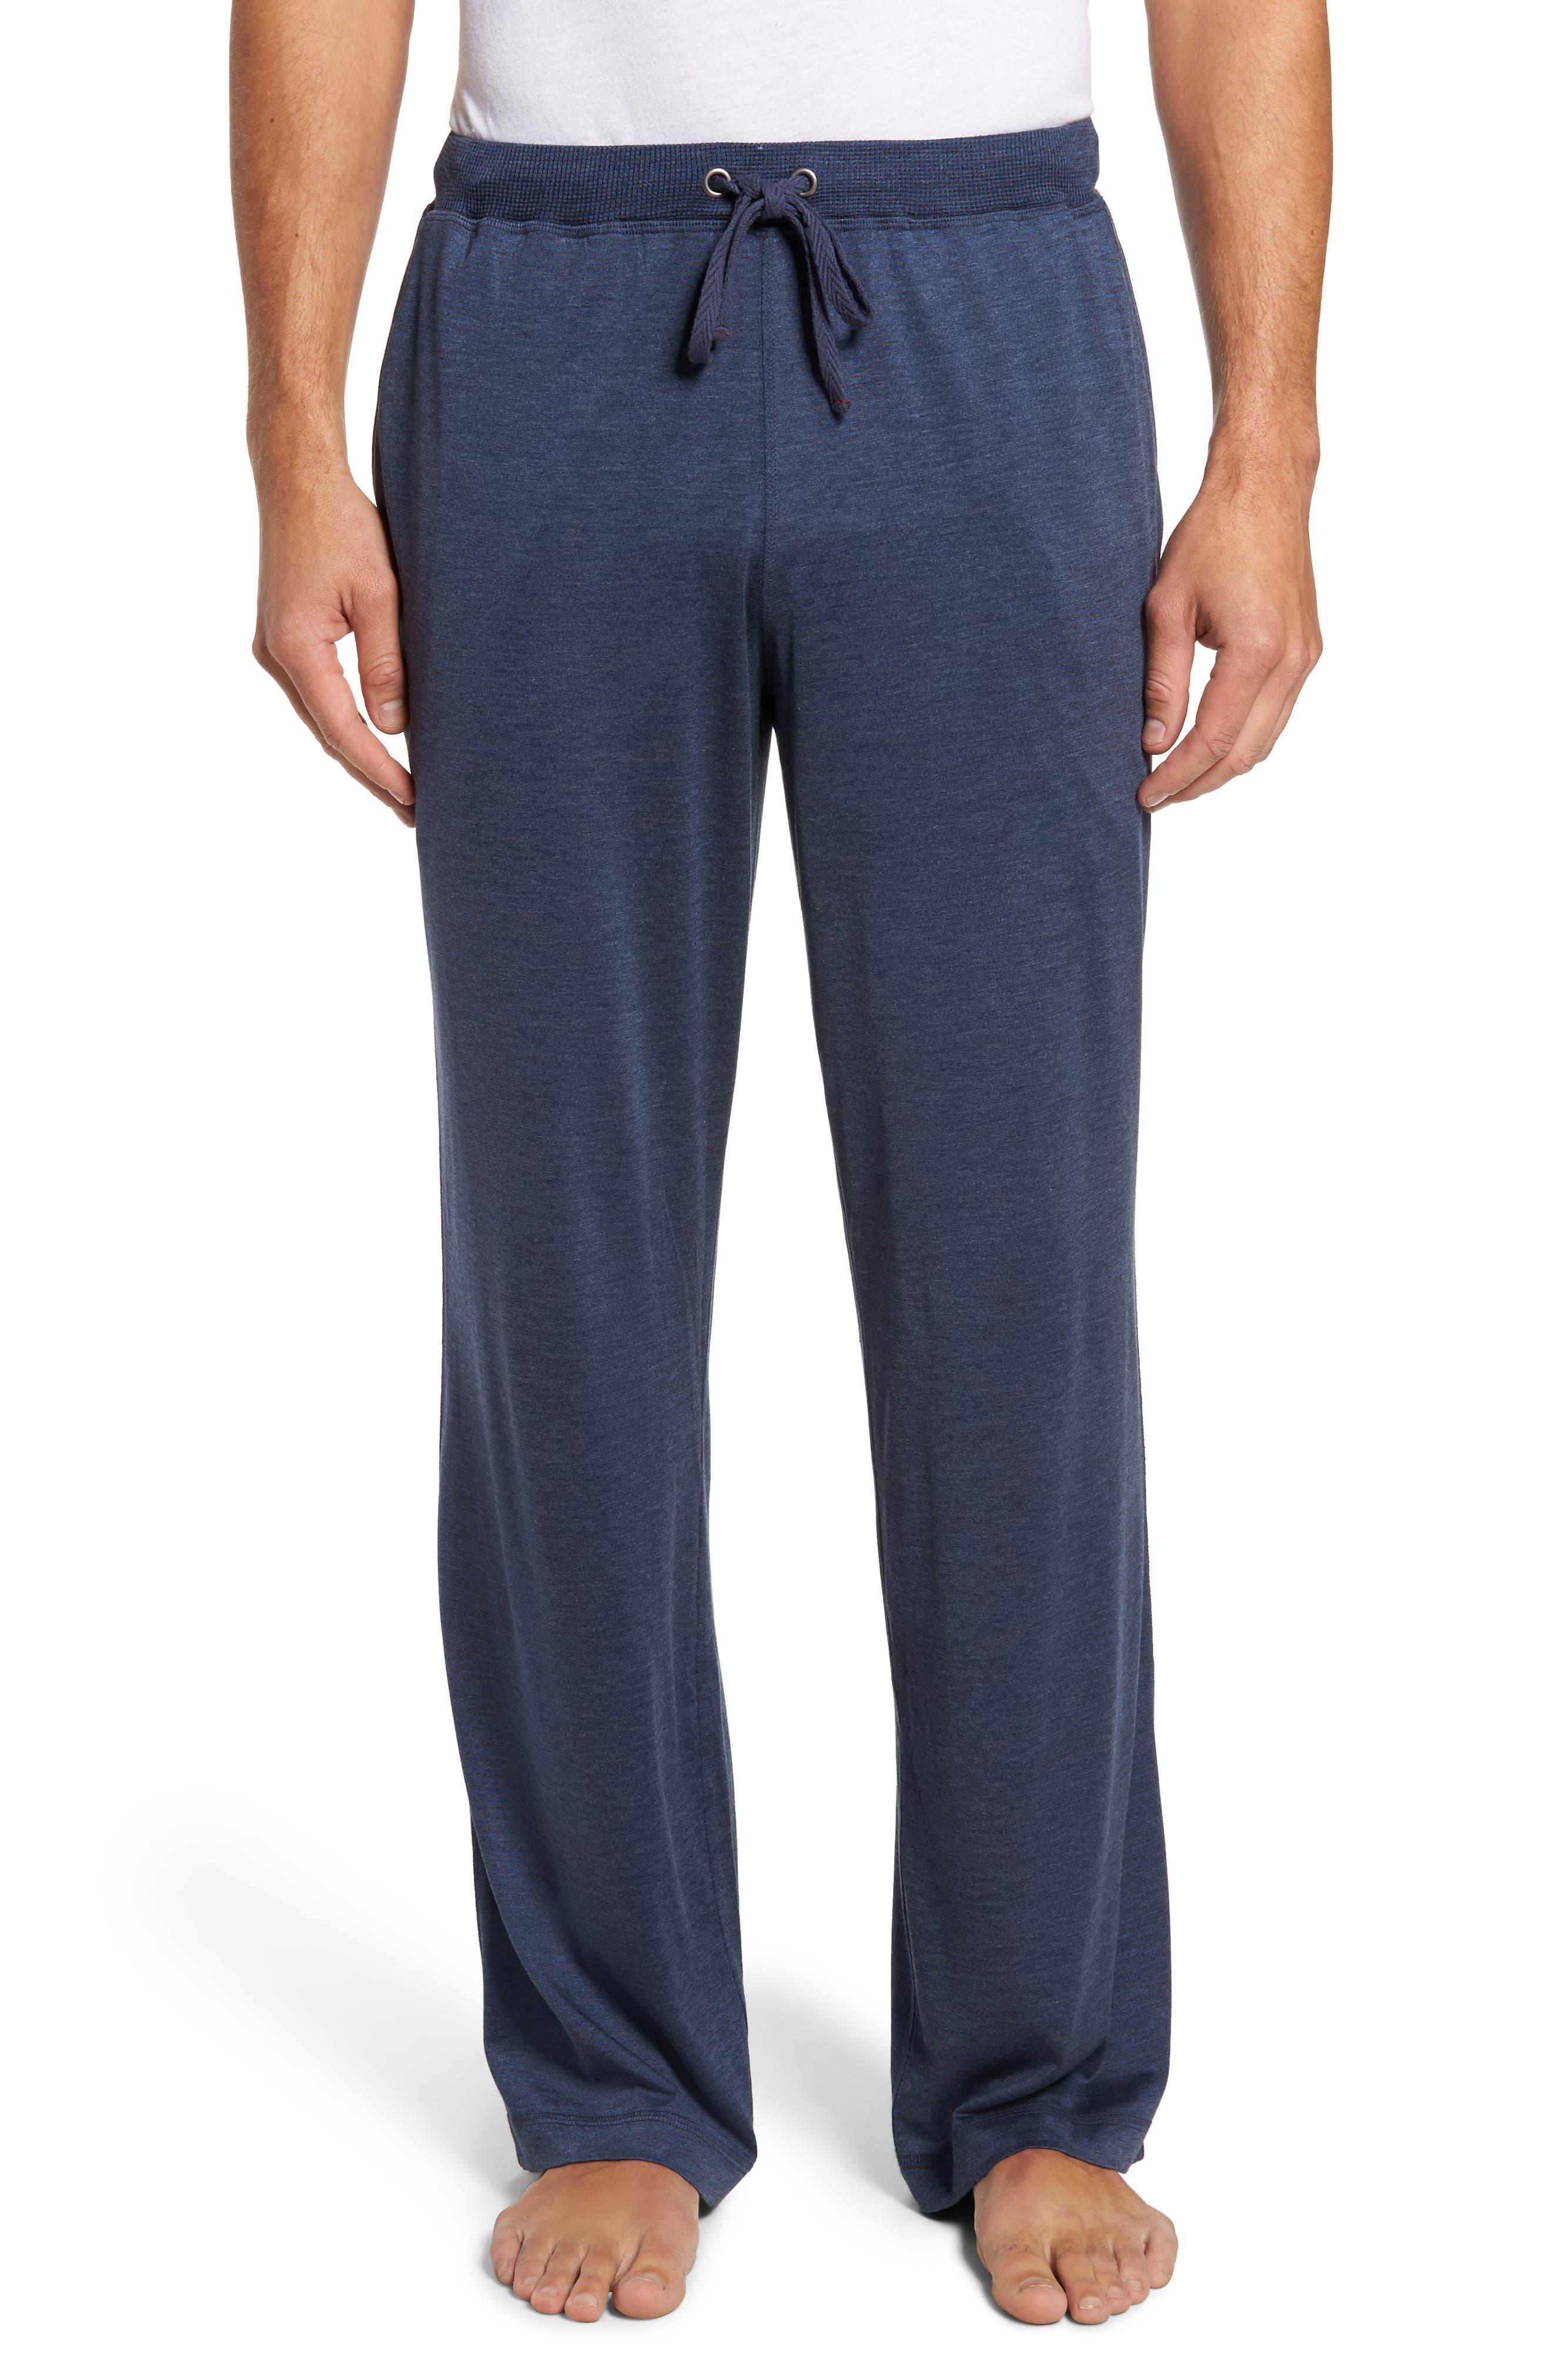 Silk & Cotton Lounge Pants,                         Main,                         color, Navy Heather